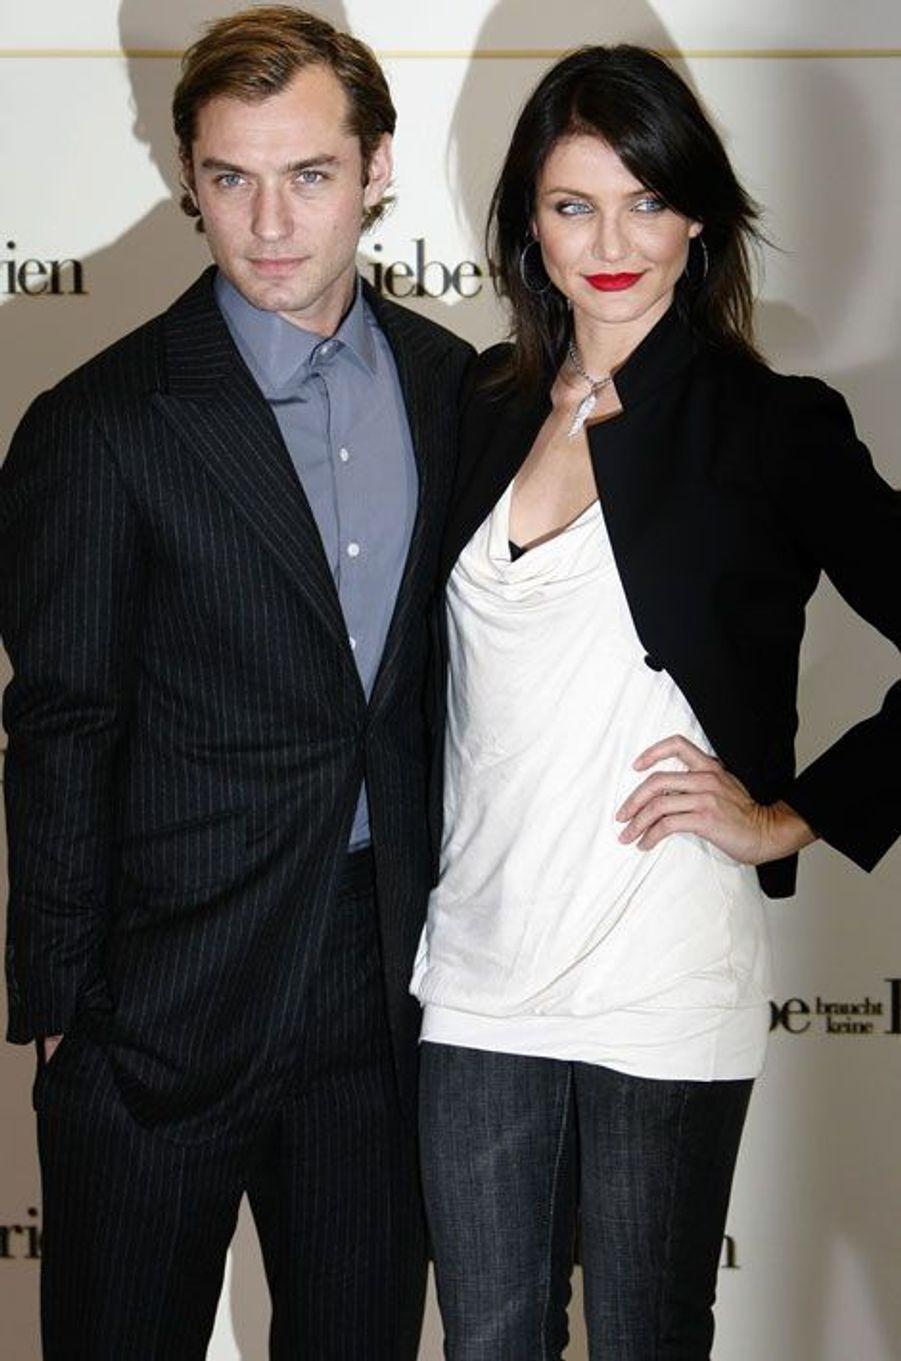 Une rumeur lui prête une idylle avec Jude Law, sa costar dans «The Holiday » (2006-2007)…